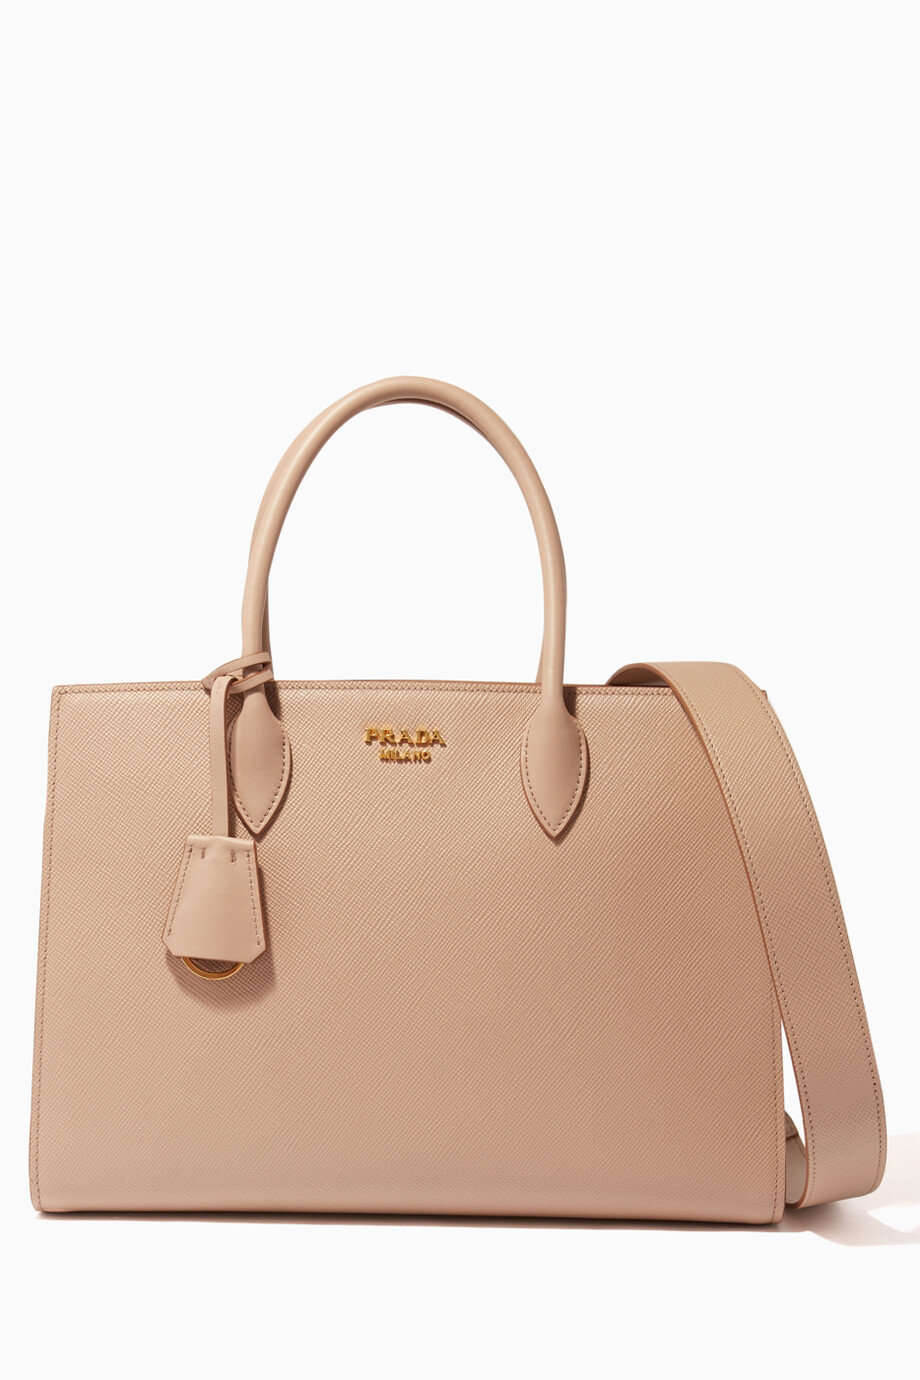 fb4e70716109 Shop Prada Neutral Beige Large Saffiano Bibliothèque Tote Bag for Women |  Ounass Kuwait